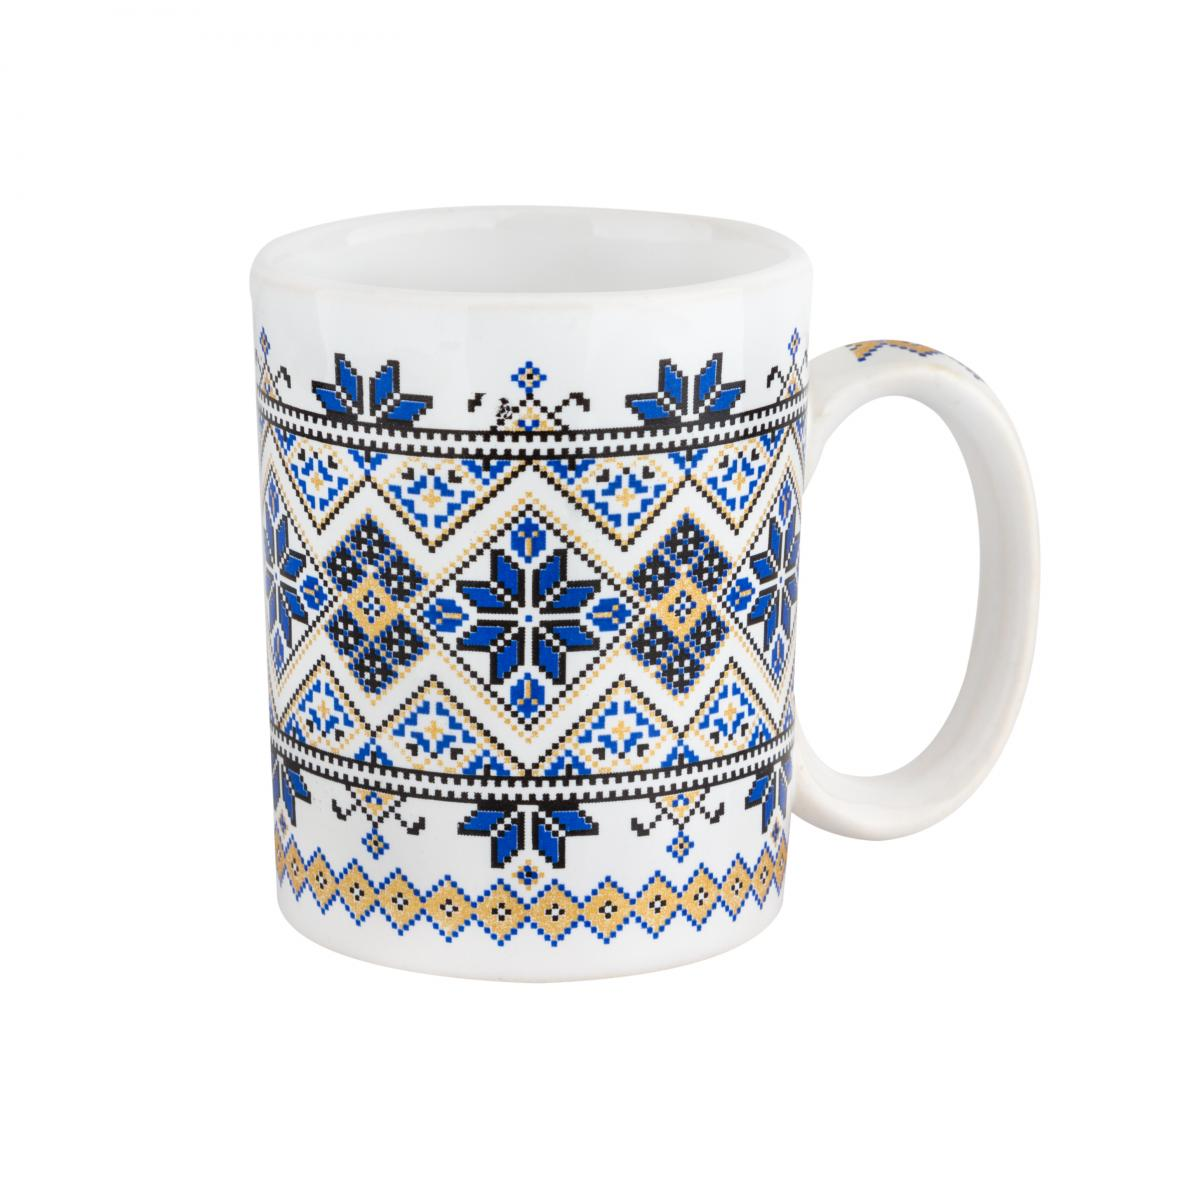 Чашка с желто-синим узором – 150 мл